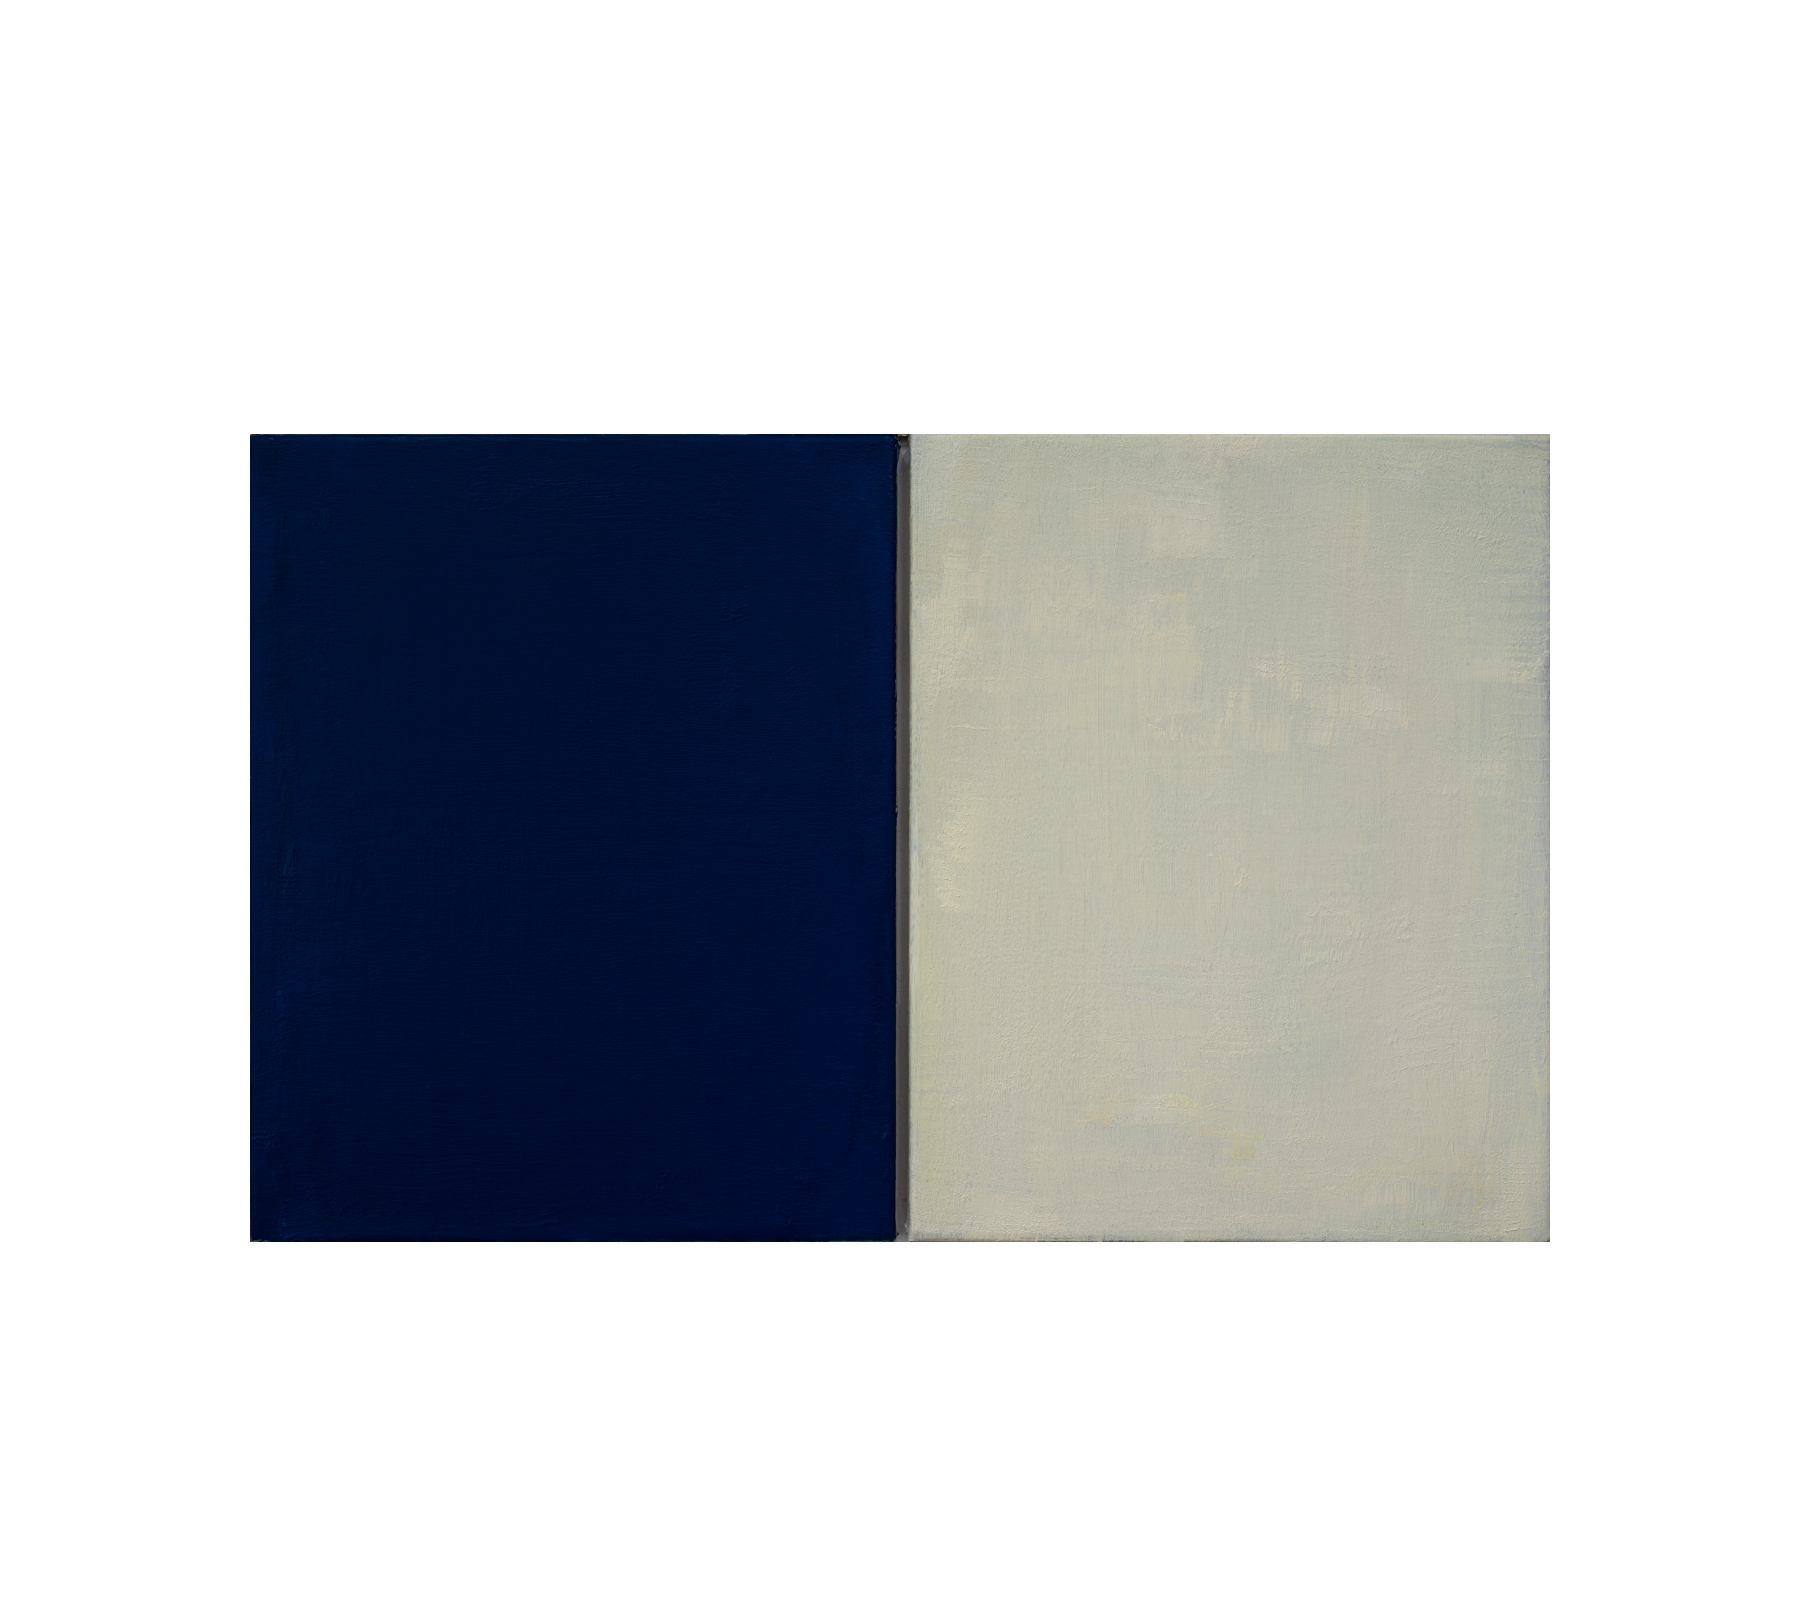 Untitled diptych 2021 50x80cm